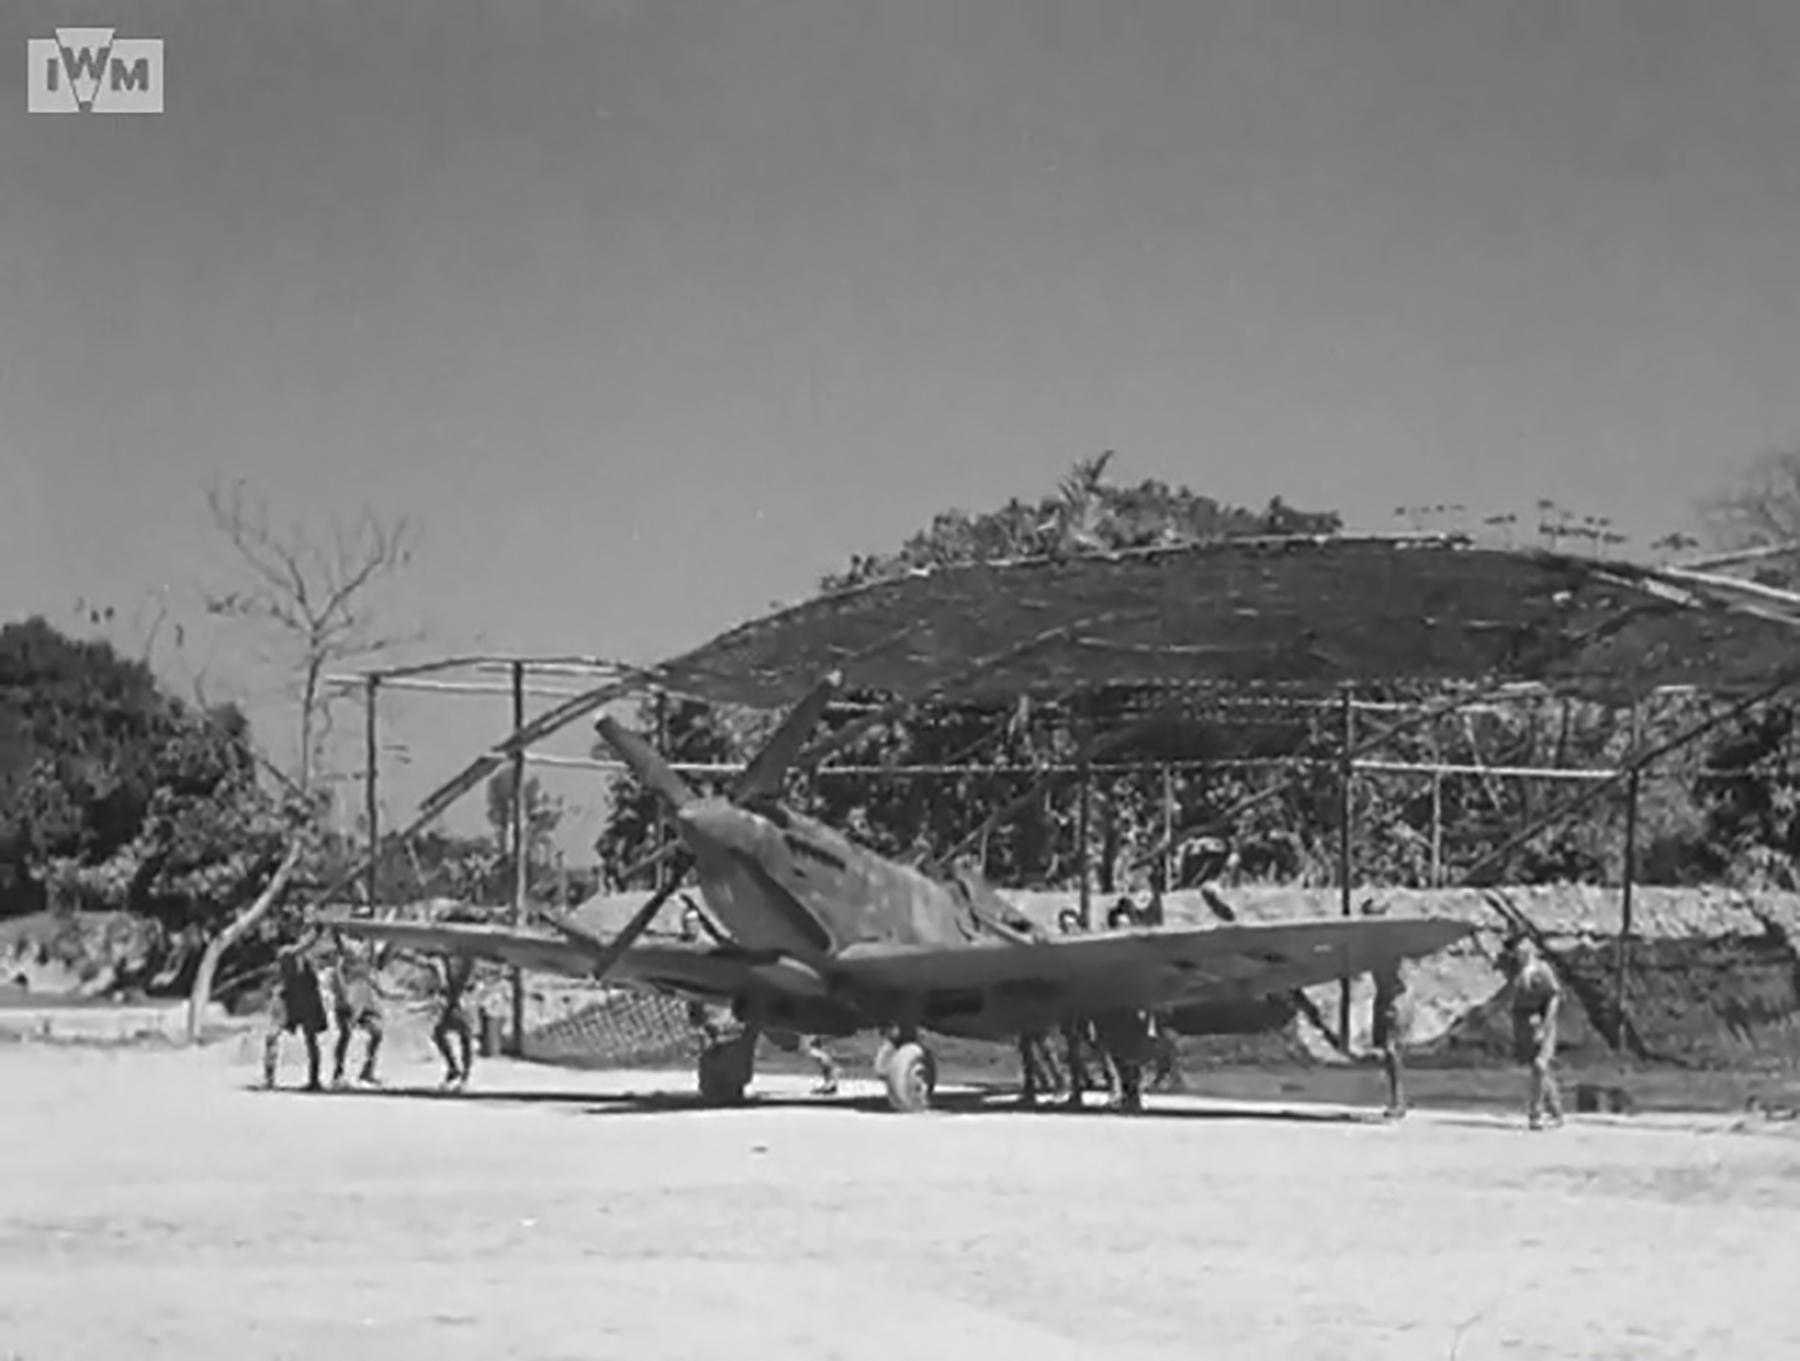 Spitfire VIII RAF 136Sqn HM being pushed out for take off from Rumkhapalong Bangladesh CBI 1944 IWM 01